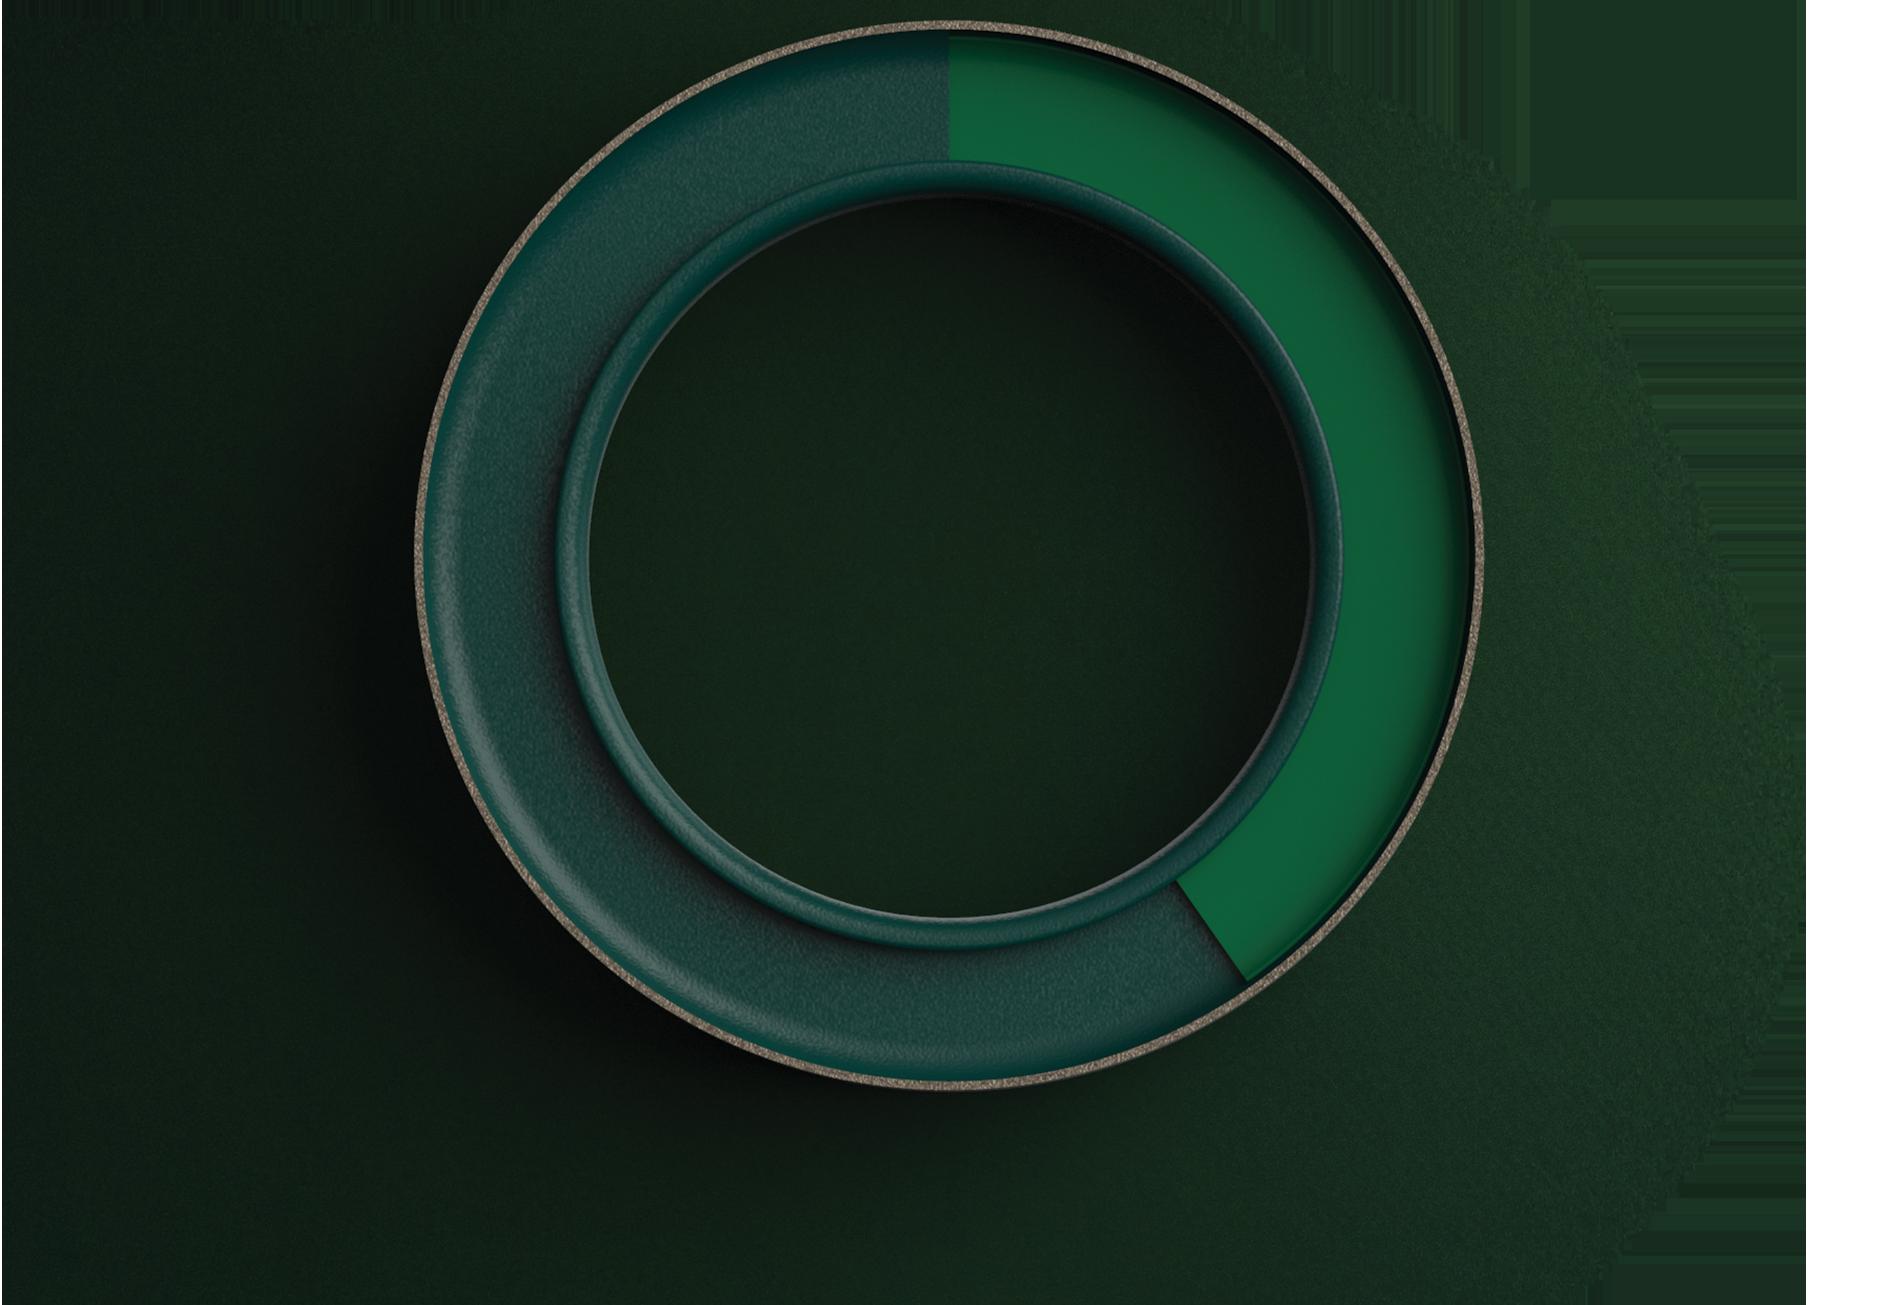 Saviour_Emerald_Landscape_Object.png